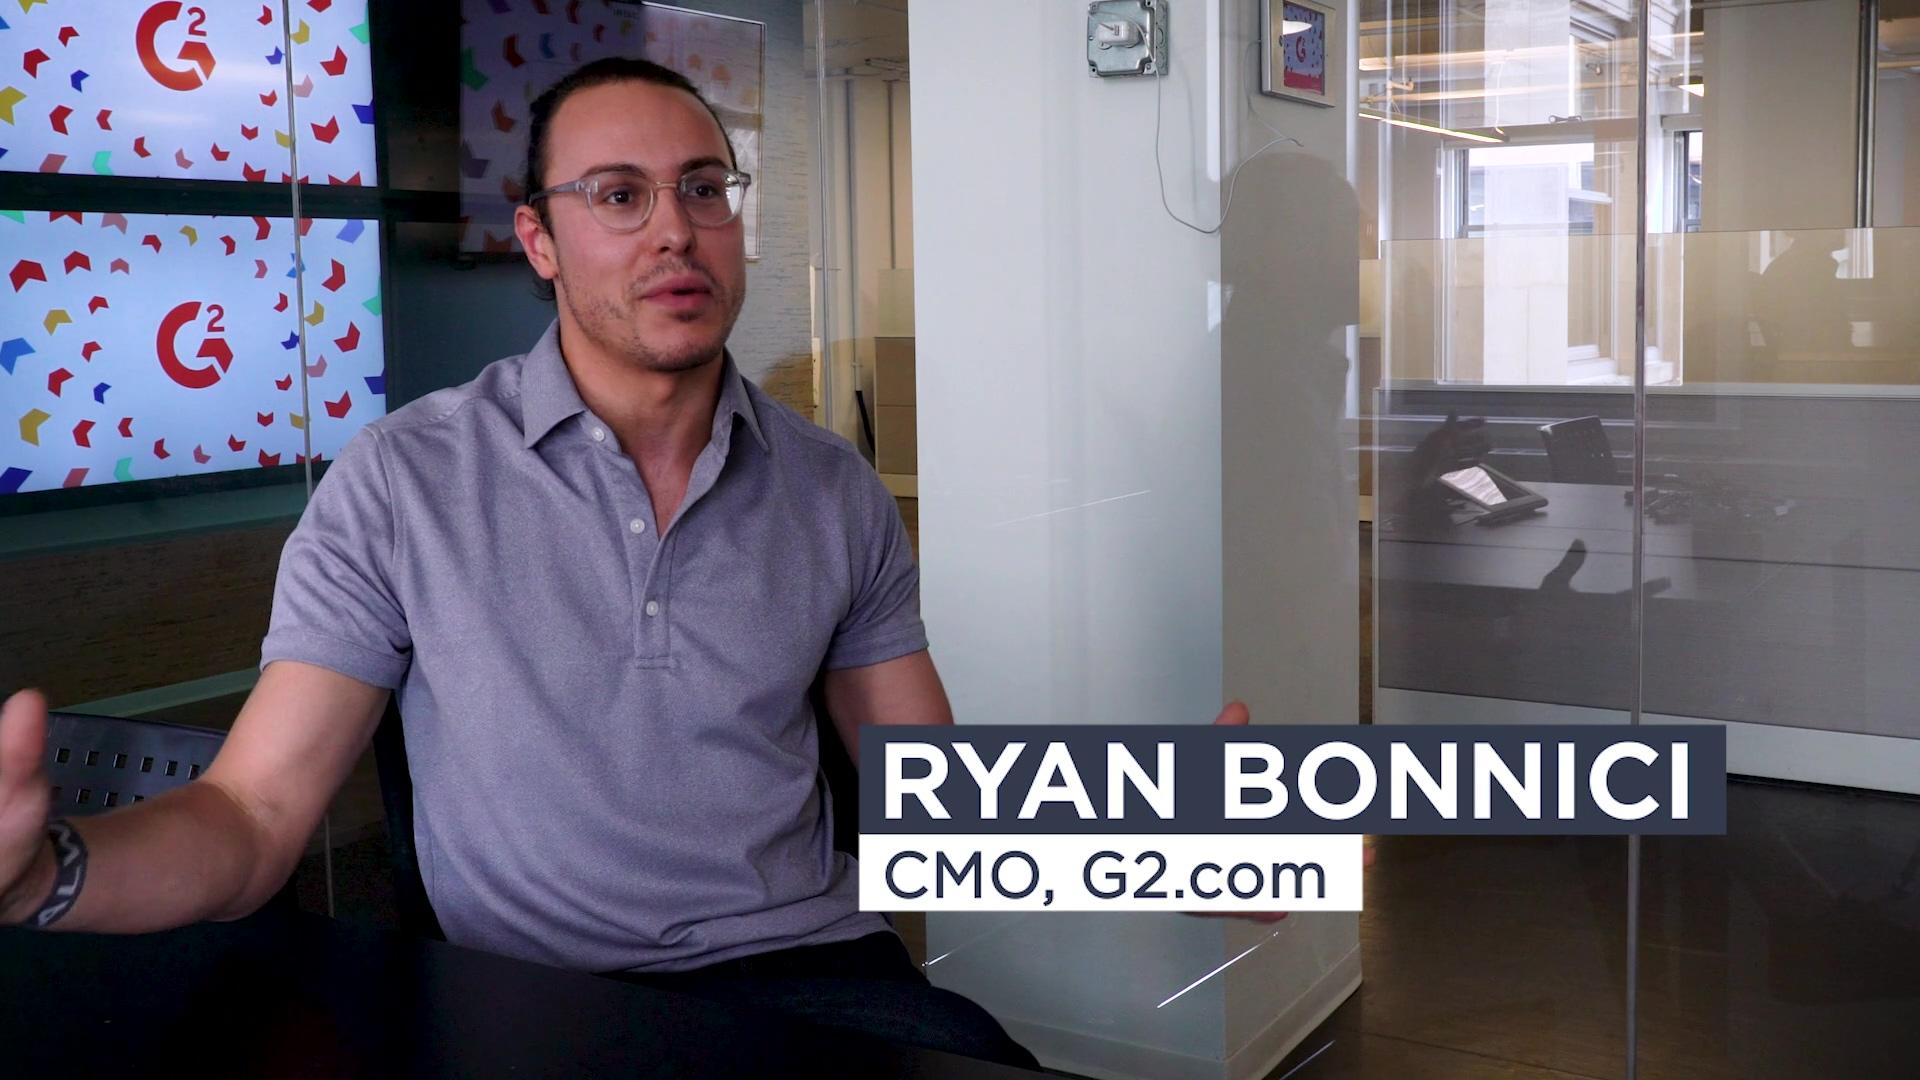 G2 Grows Their Marketing Team 10x With Hunt Club